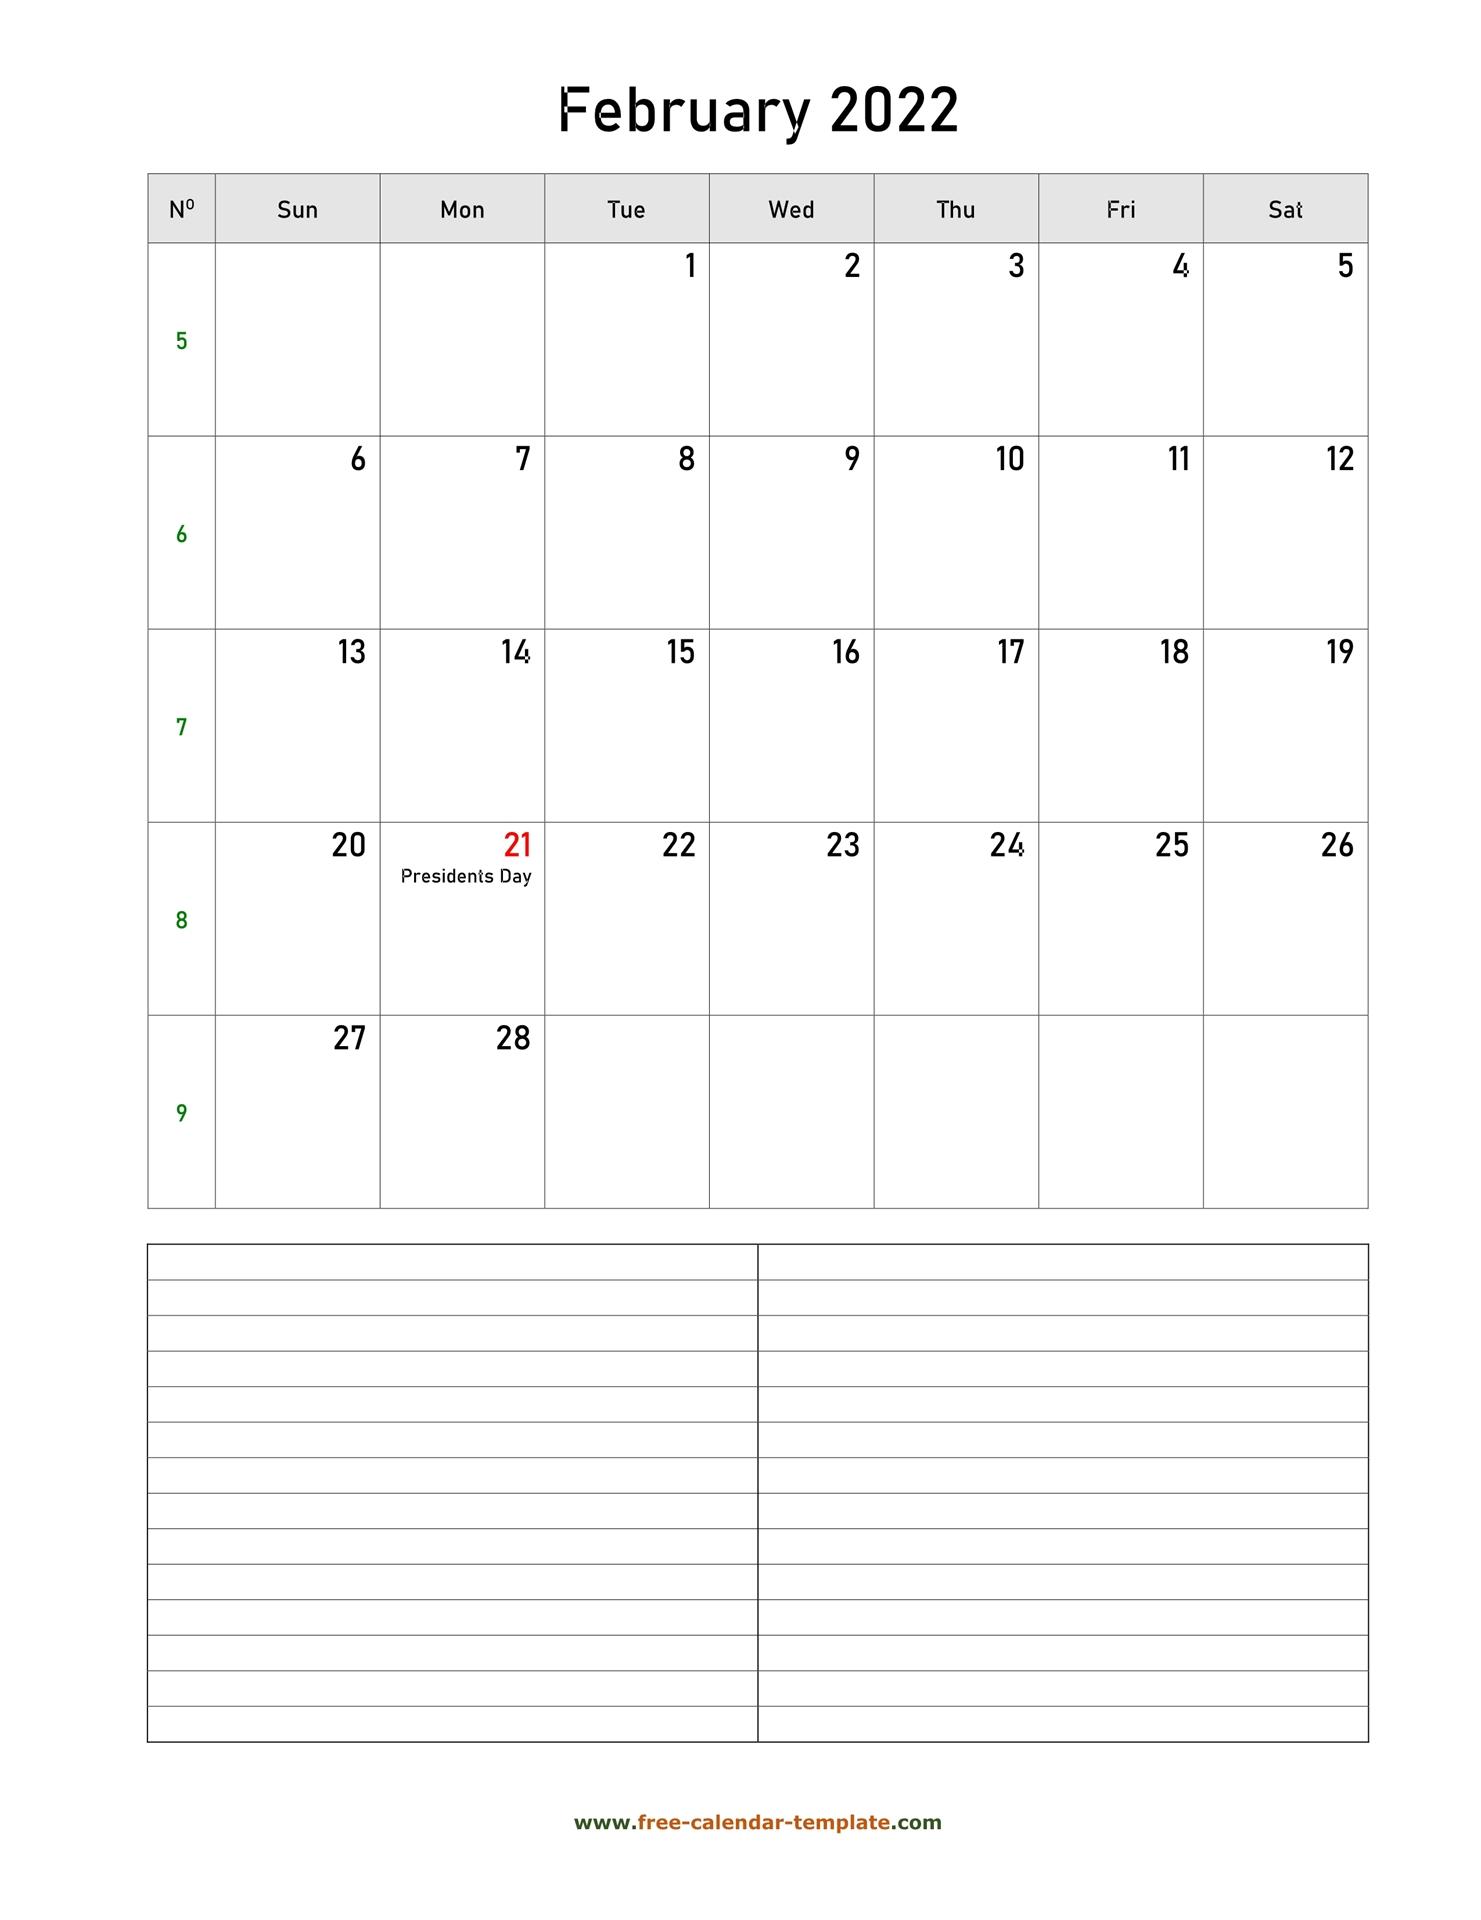 February 2022 Free Calendar Tempplate | Free-Calendar with regard to February 2022 Month Calendar Page